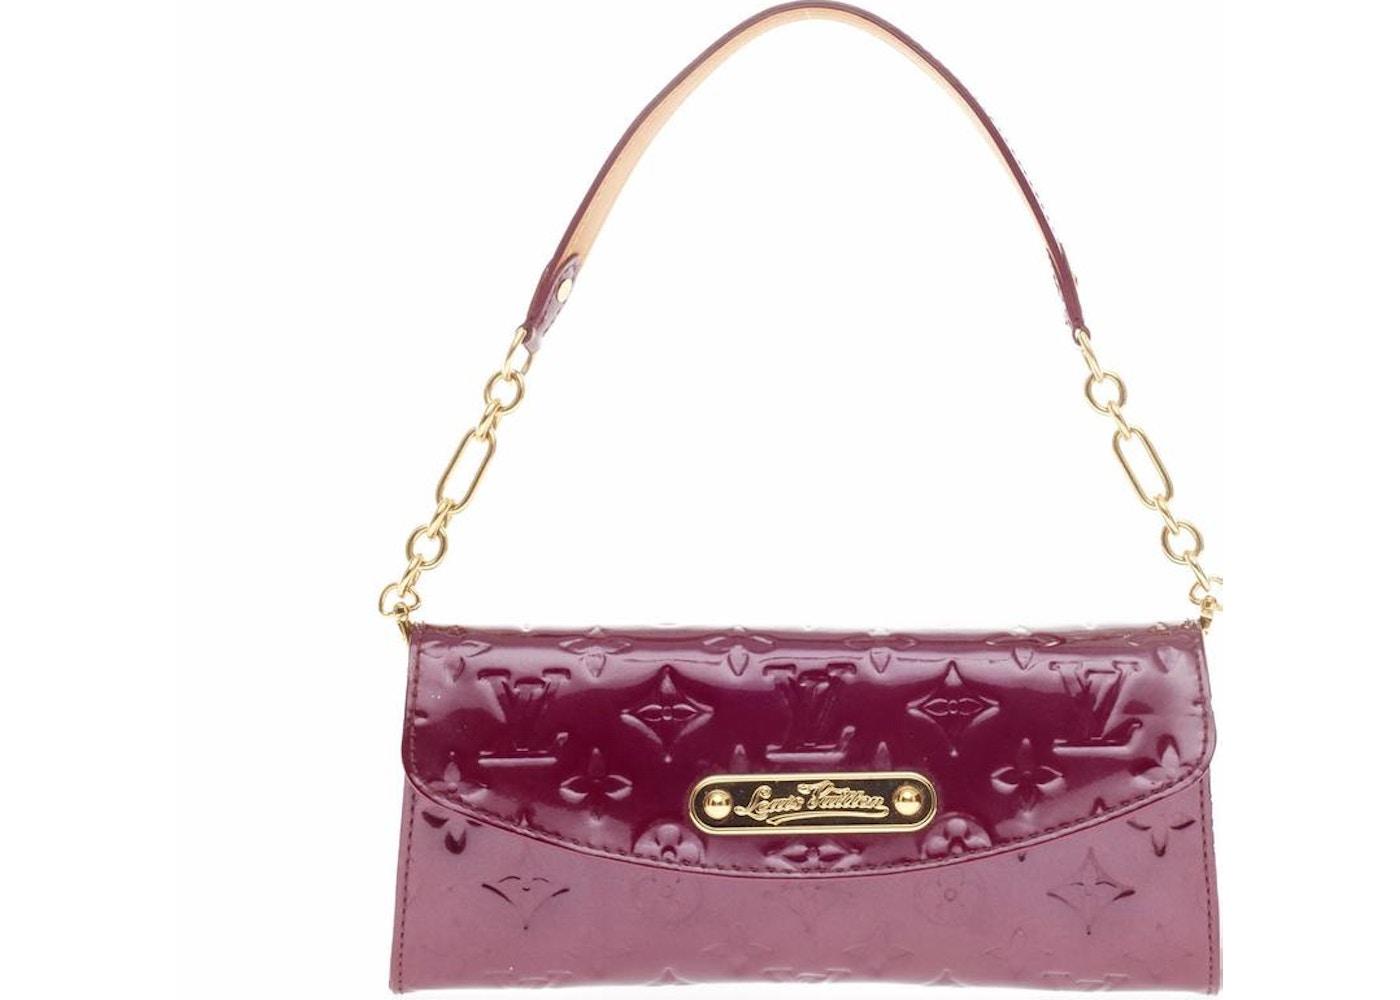 ece2dfcb4346 Louis Vuitton Clutch Sunset Boulevard Monogram Vernis Violette. Monogram  Vernis Violette